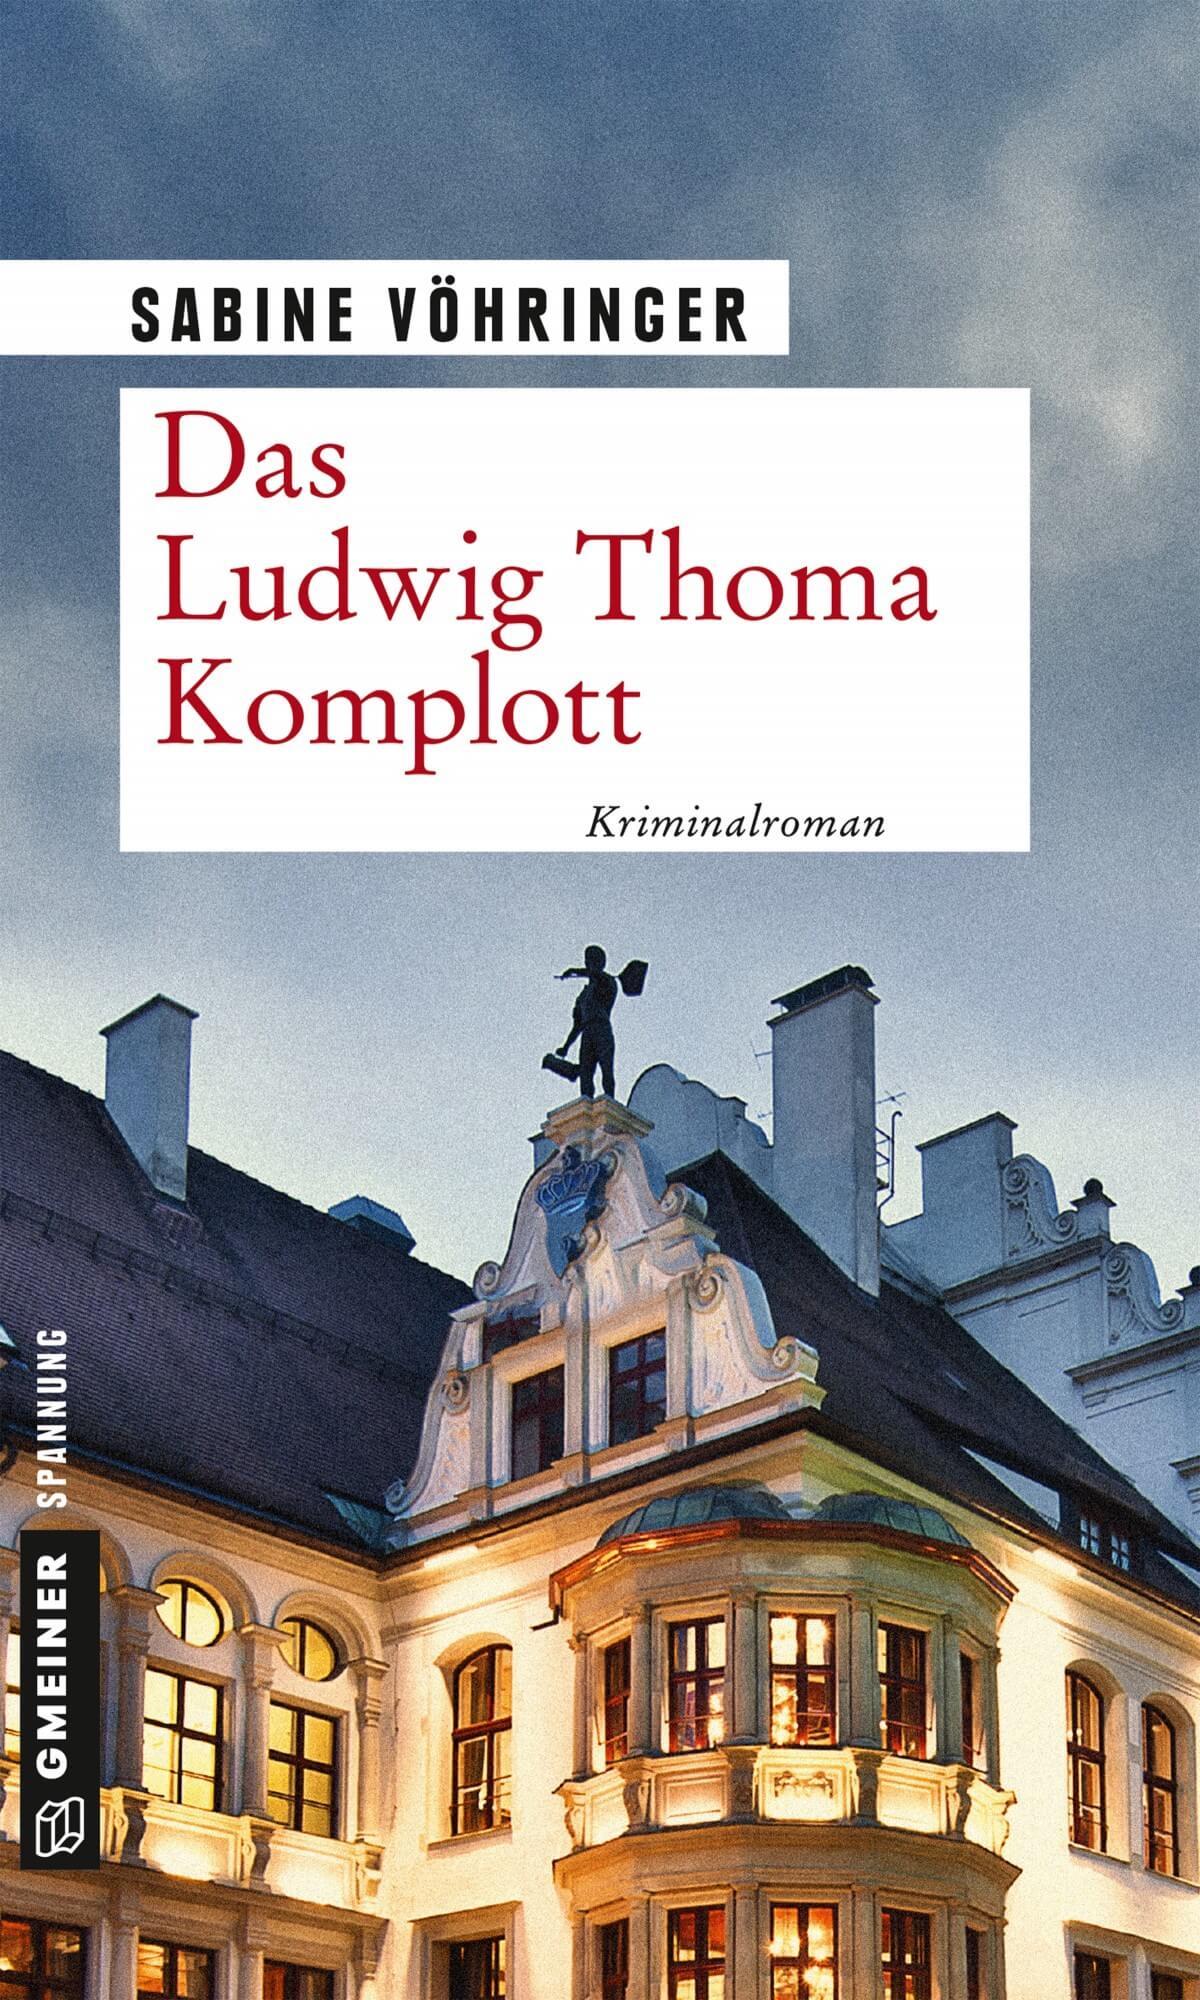 Das Ludwig Thoma Komplott Sabine Voehringer